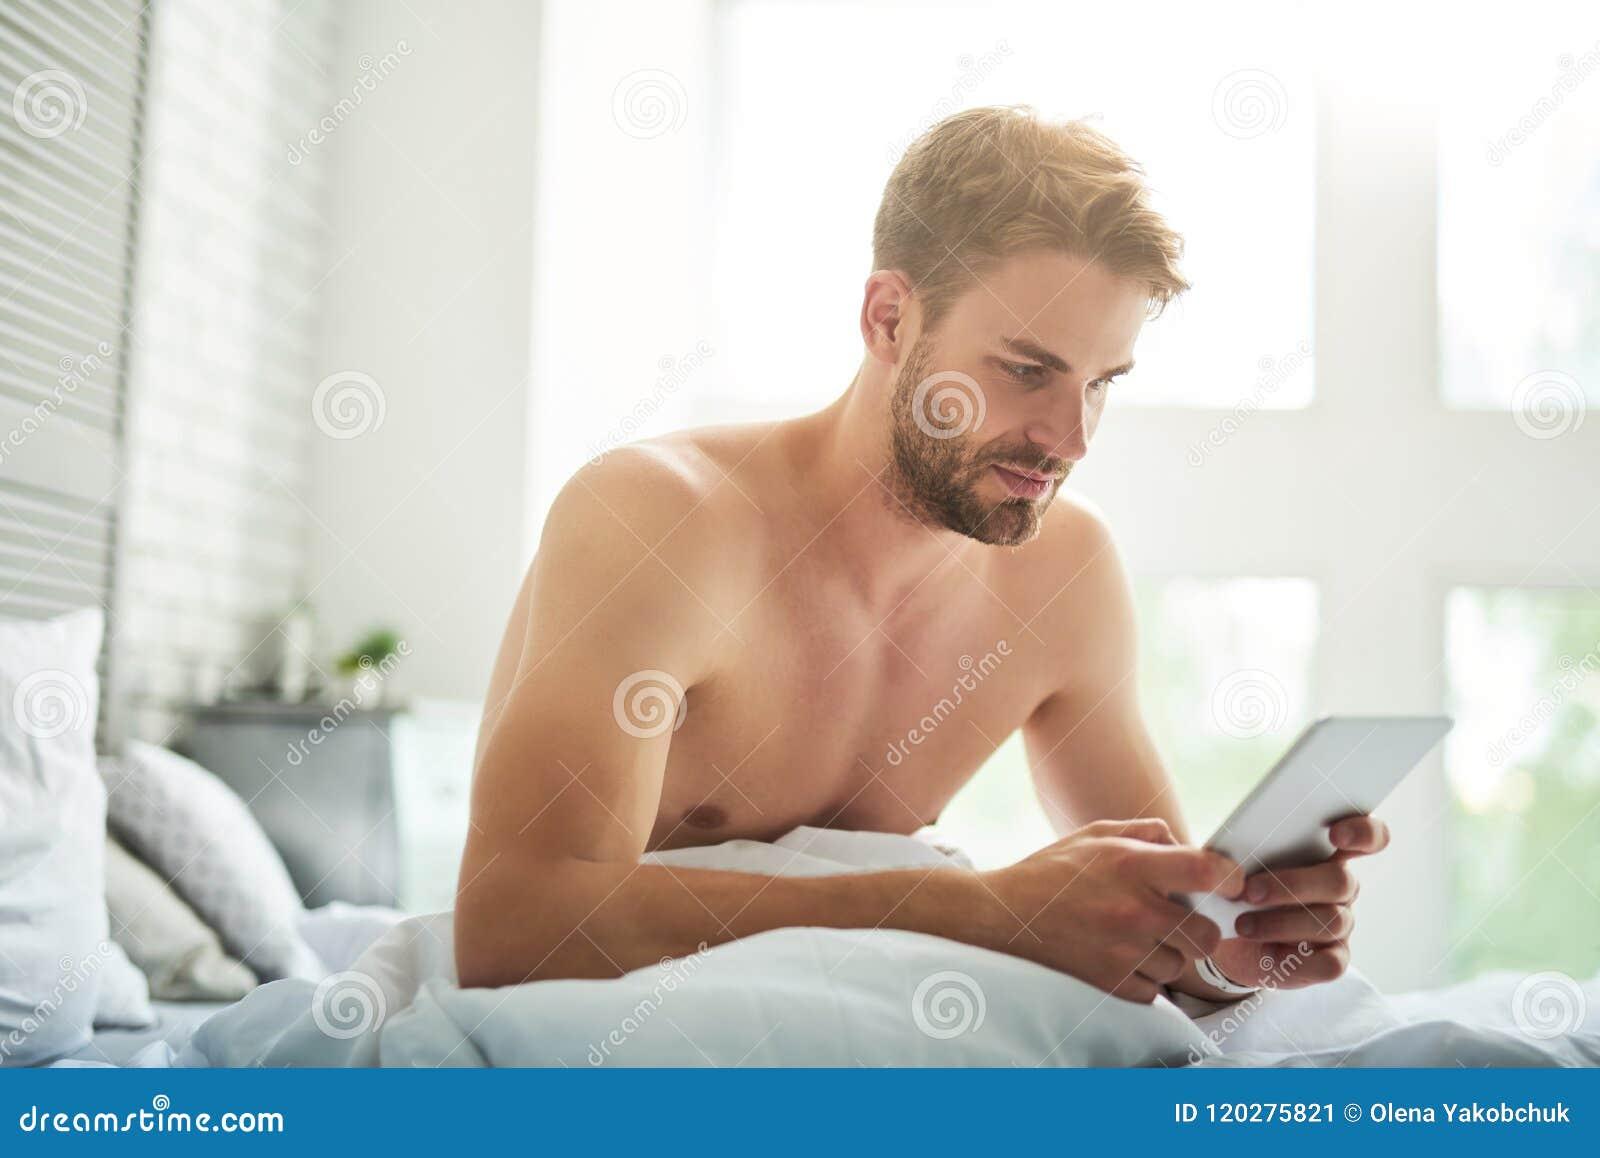 Hot sexy lesbian sex gif